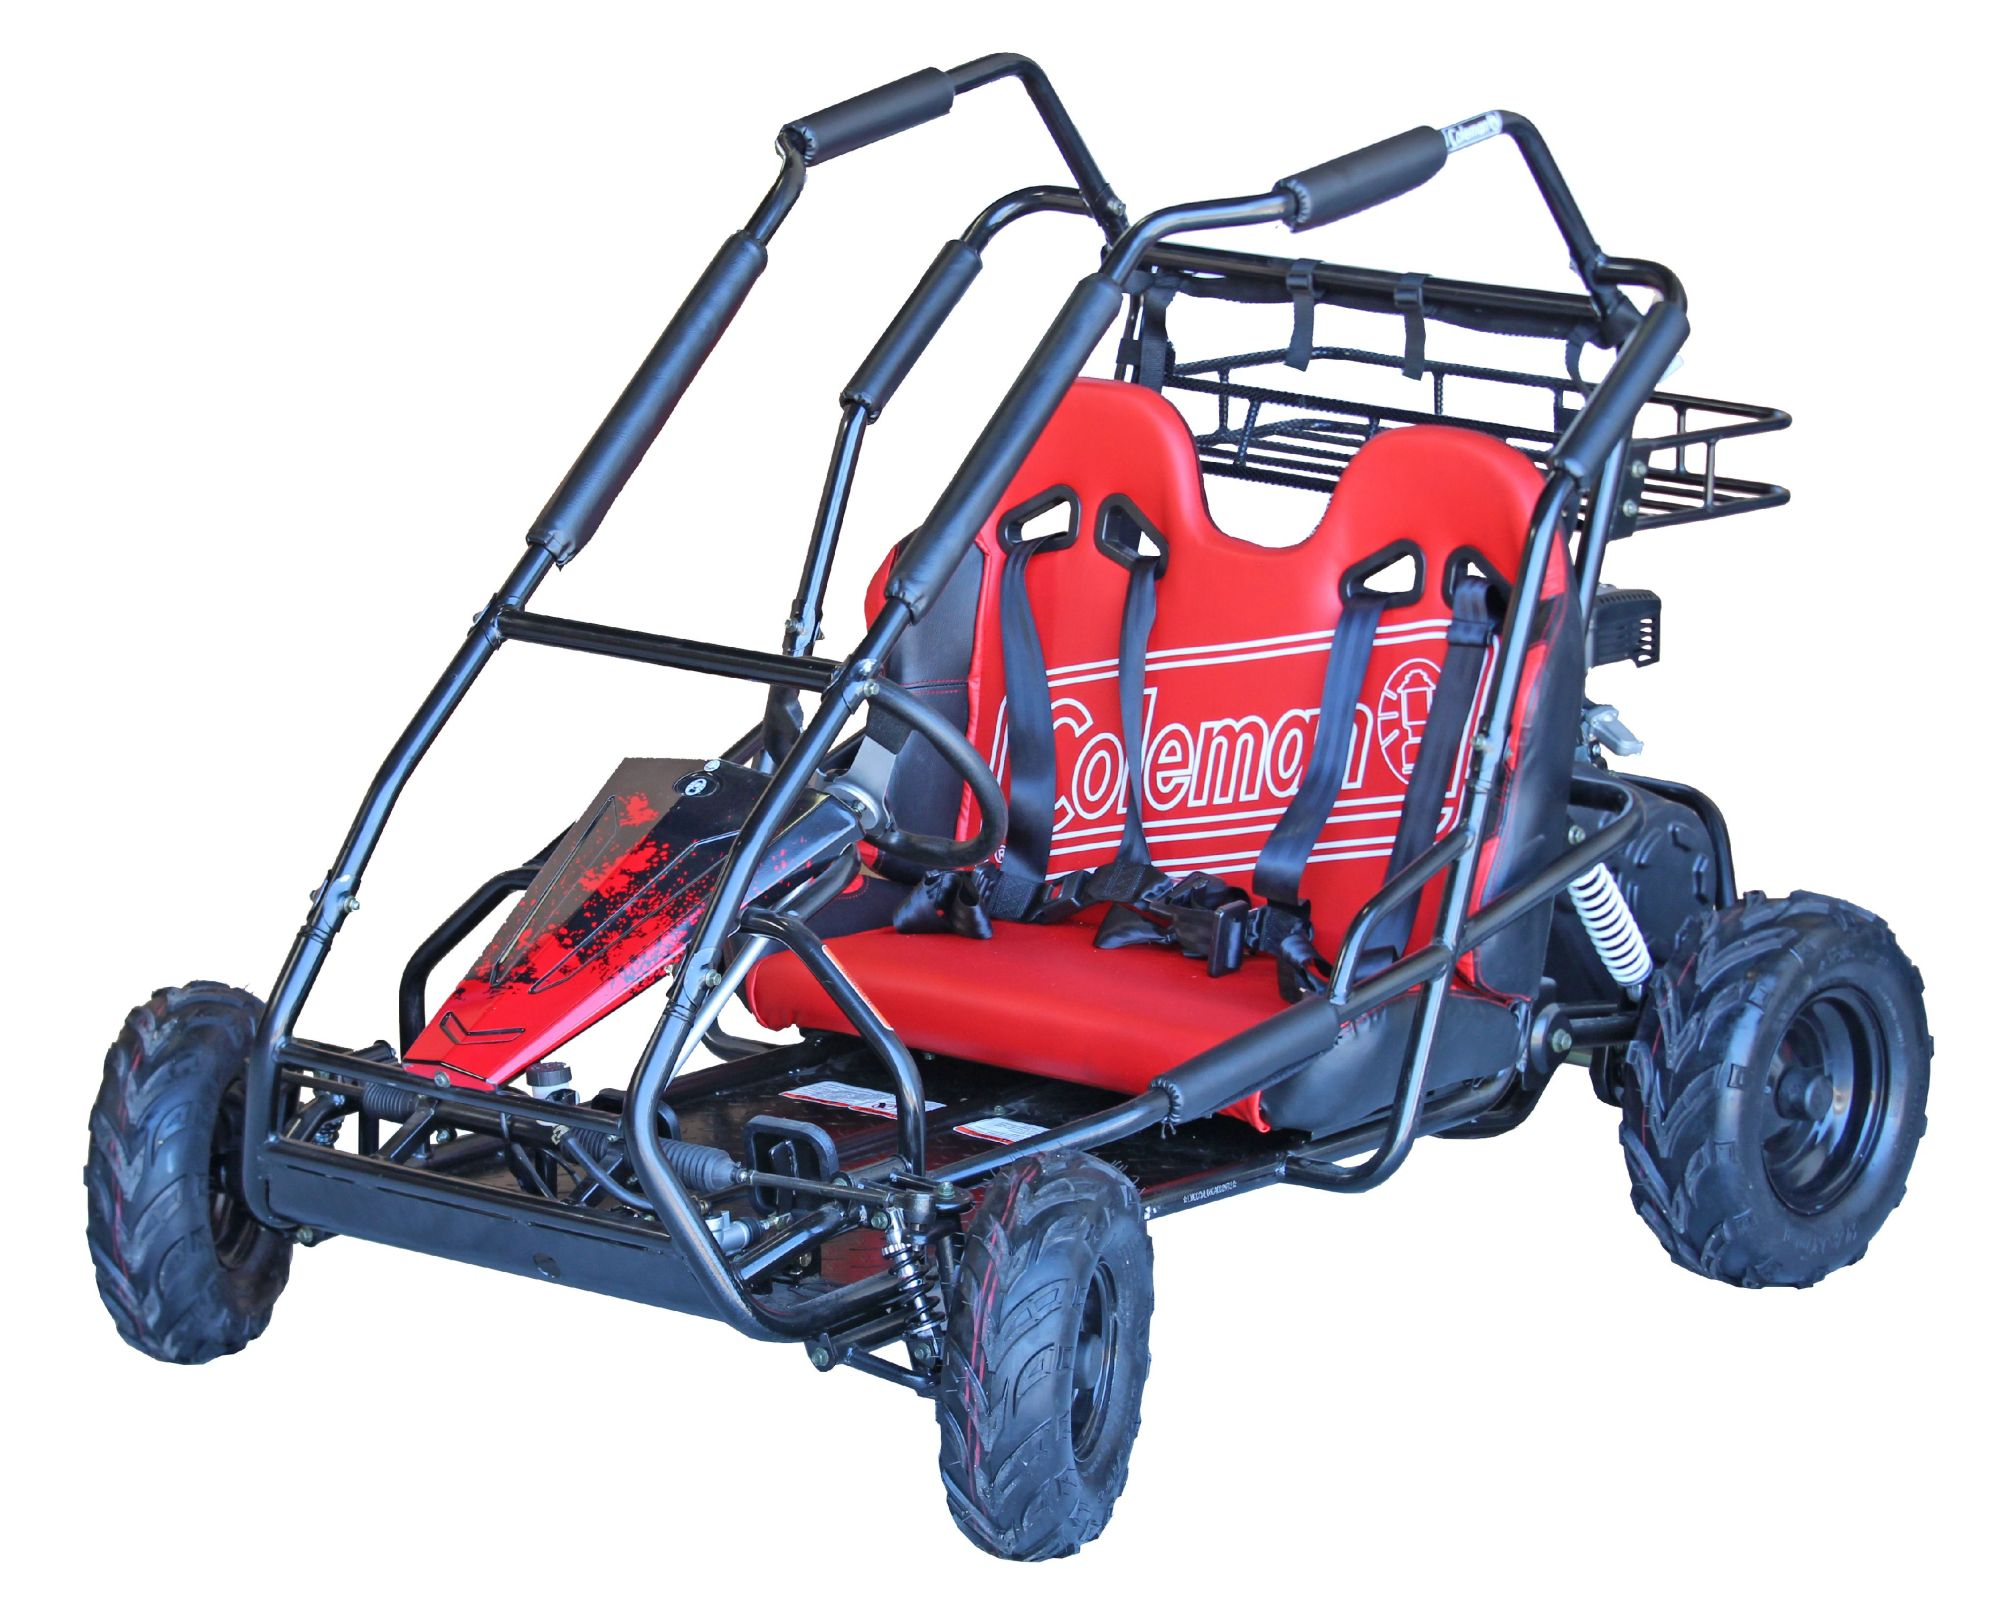 hight resolution of coleman powersports kt196 196cc gas powered go kart black walmart com